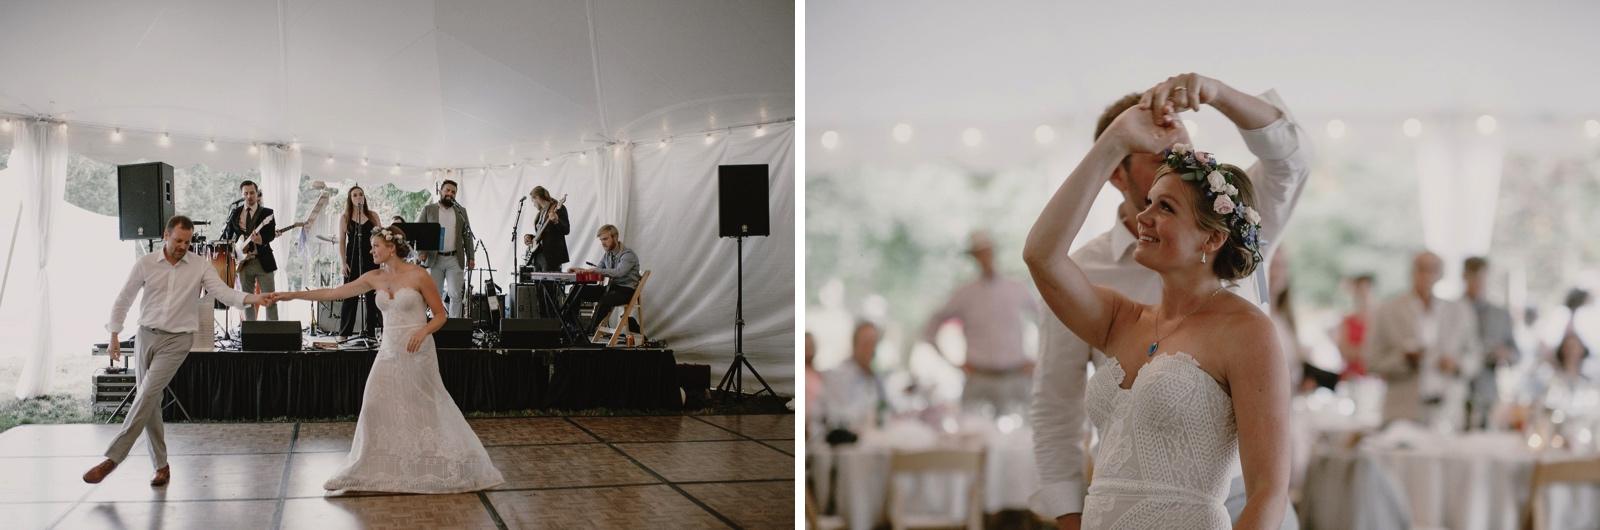 Backyard_Vashon_Island_Wedding_Kristen_Marie_Parker073.JPG